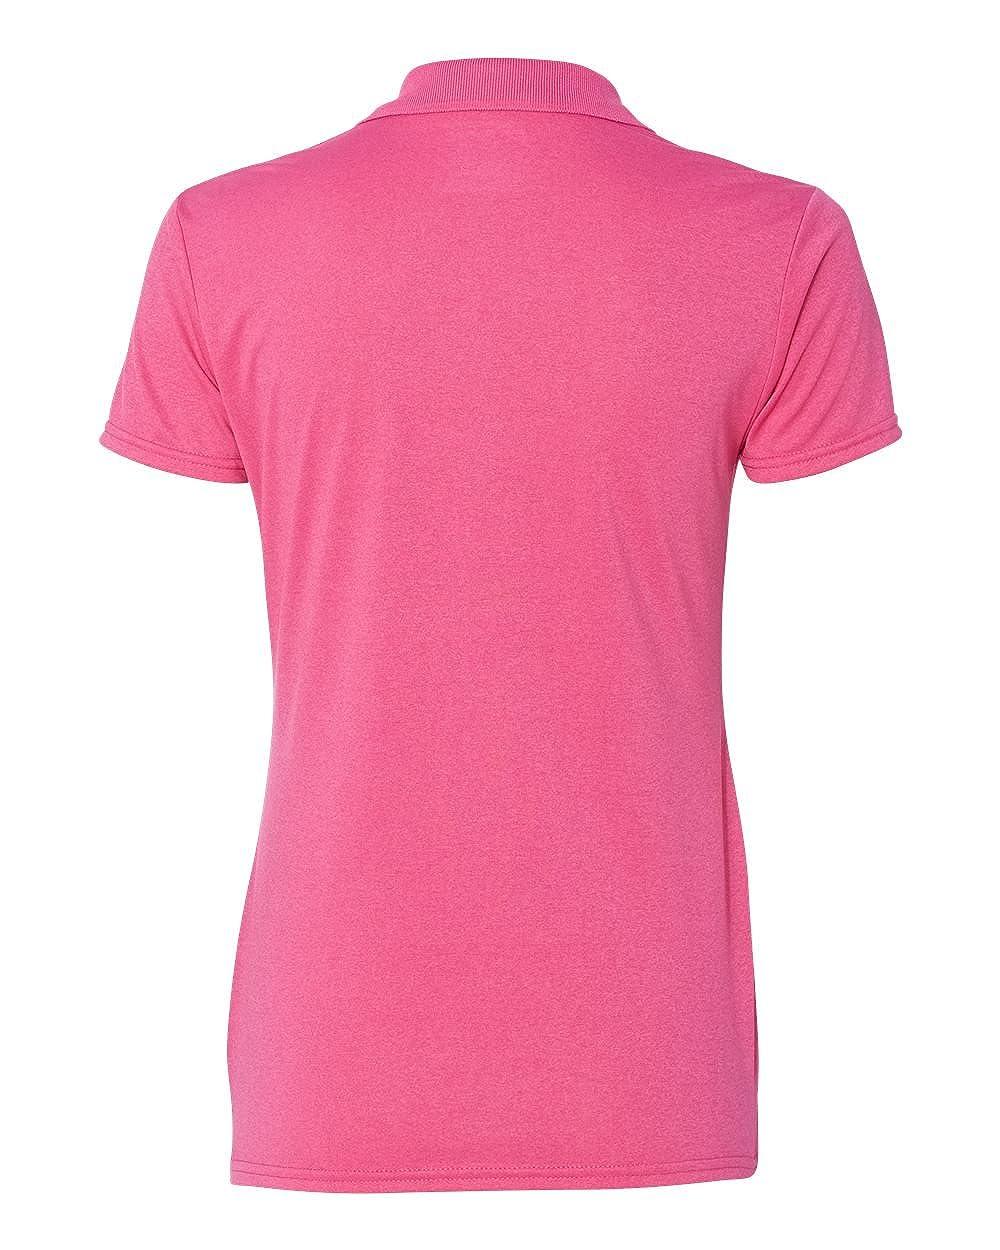 Gildan G448L Performance Ladies Polo Shirt: Amazon.es: Ropa y ...